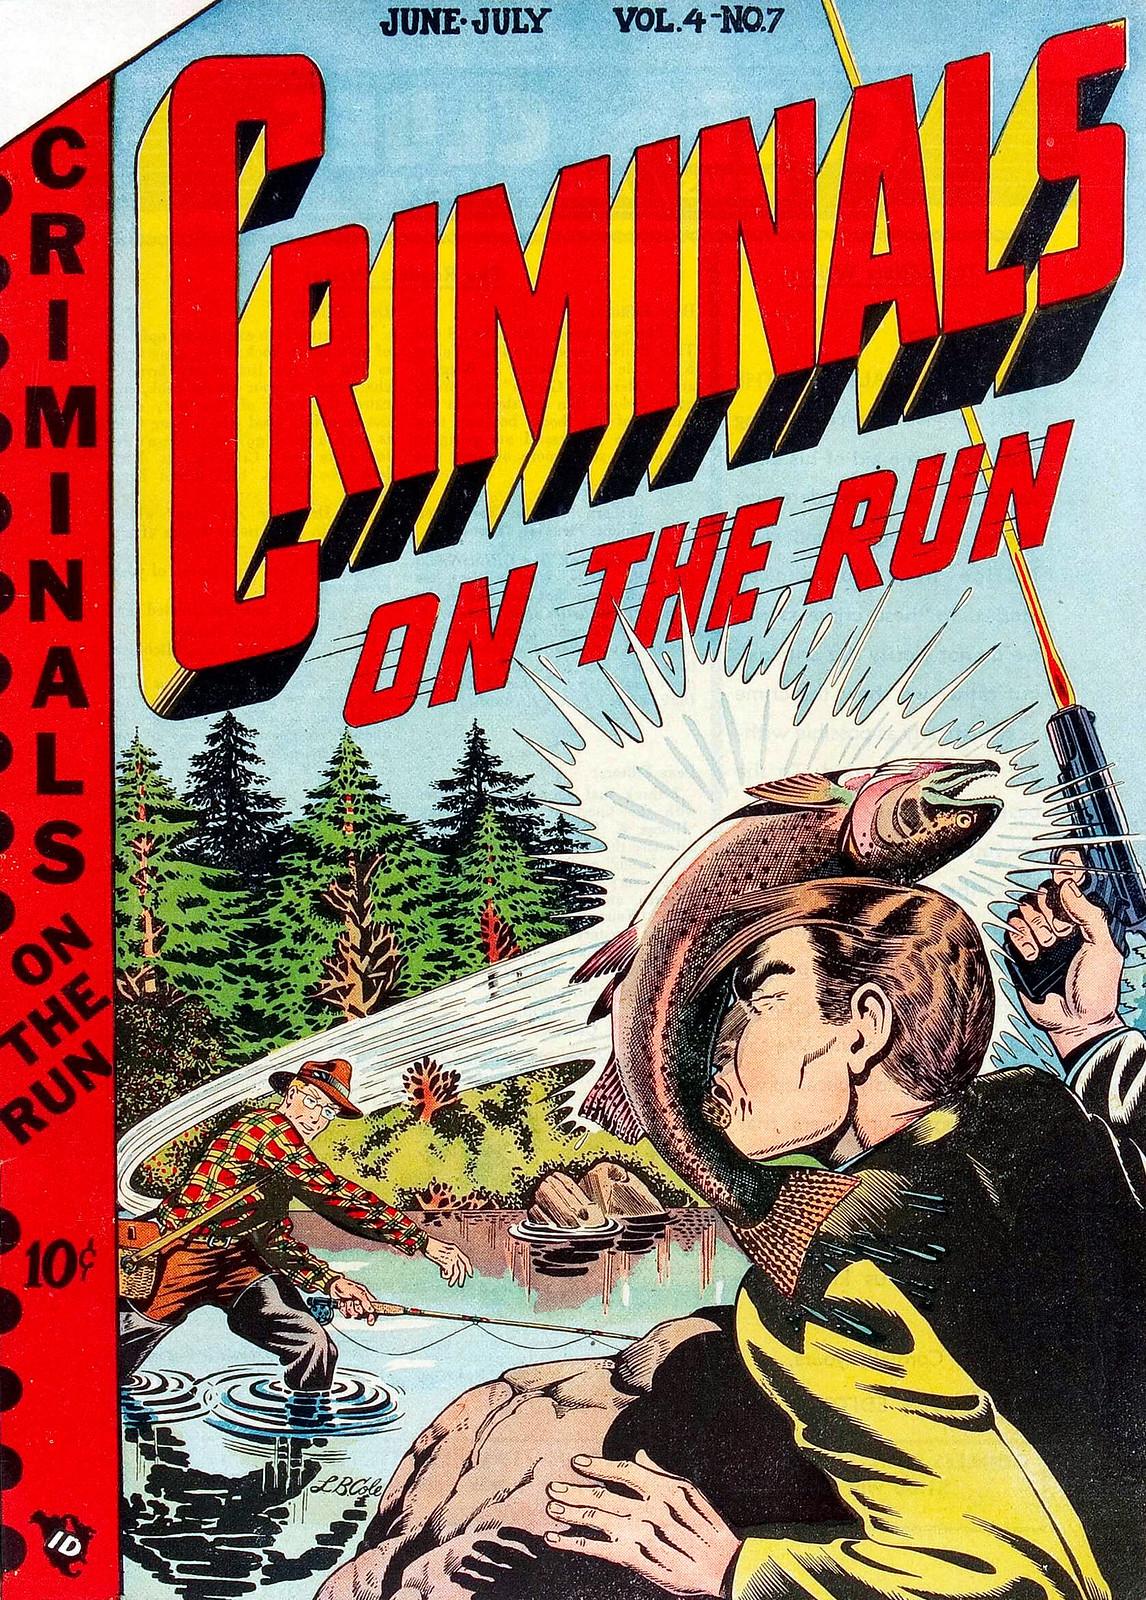 criminals on the run